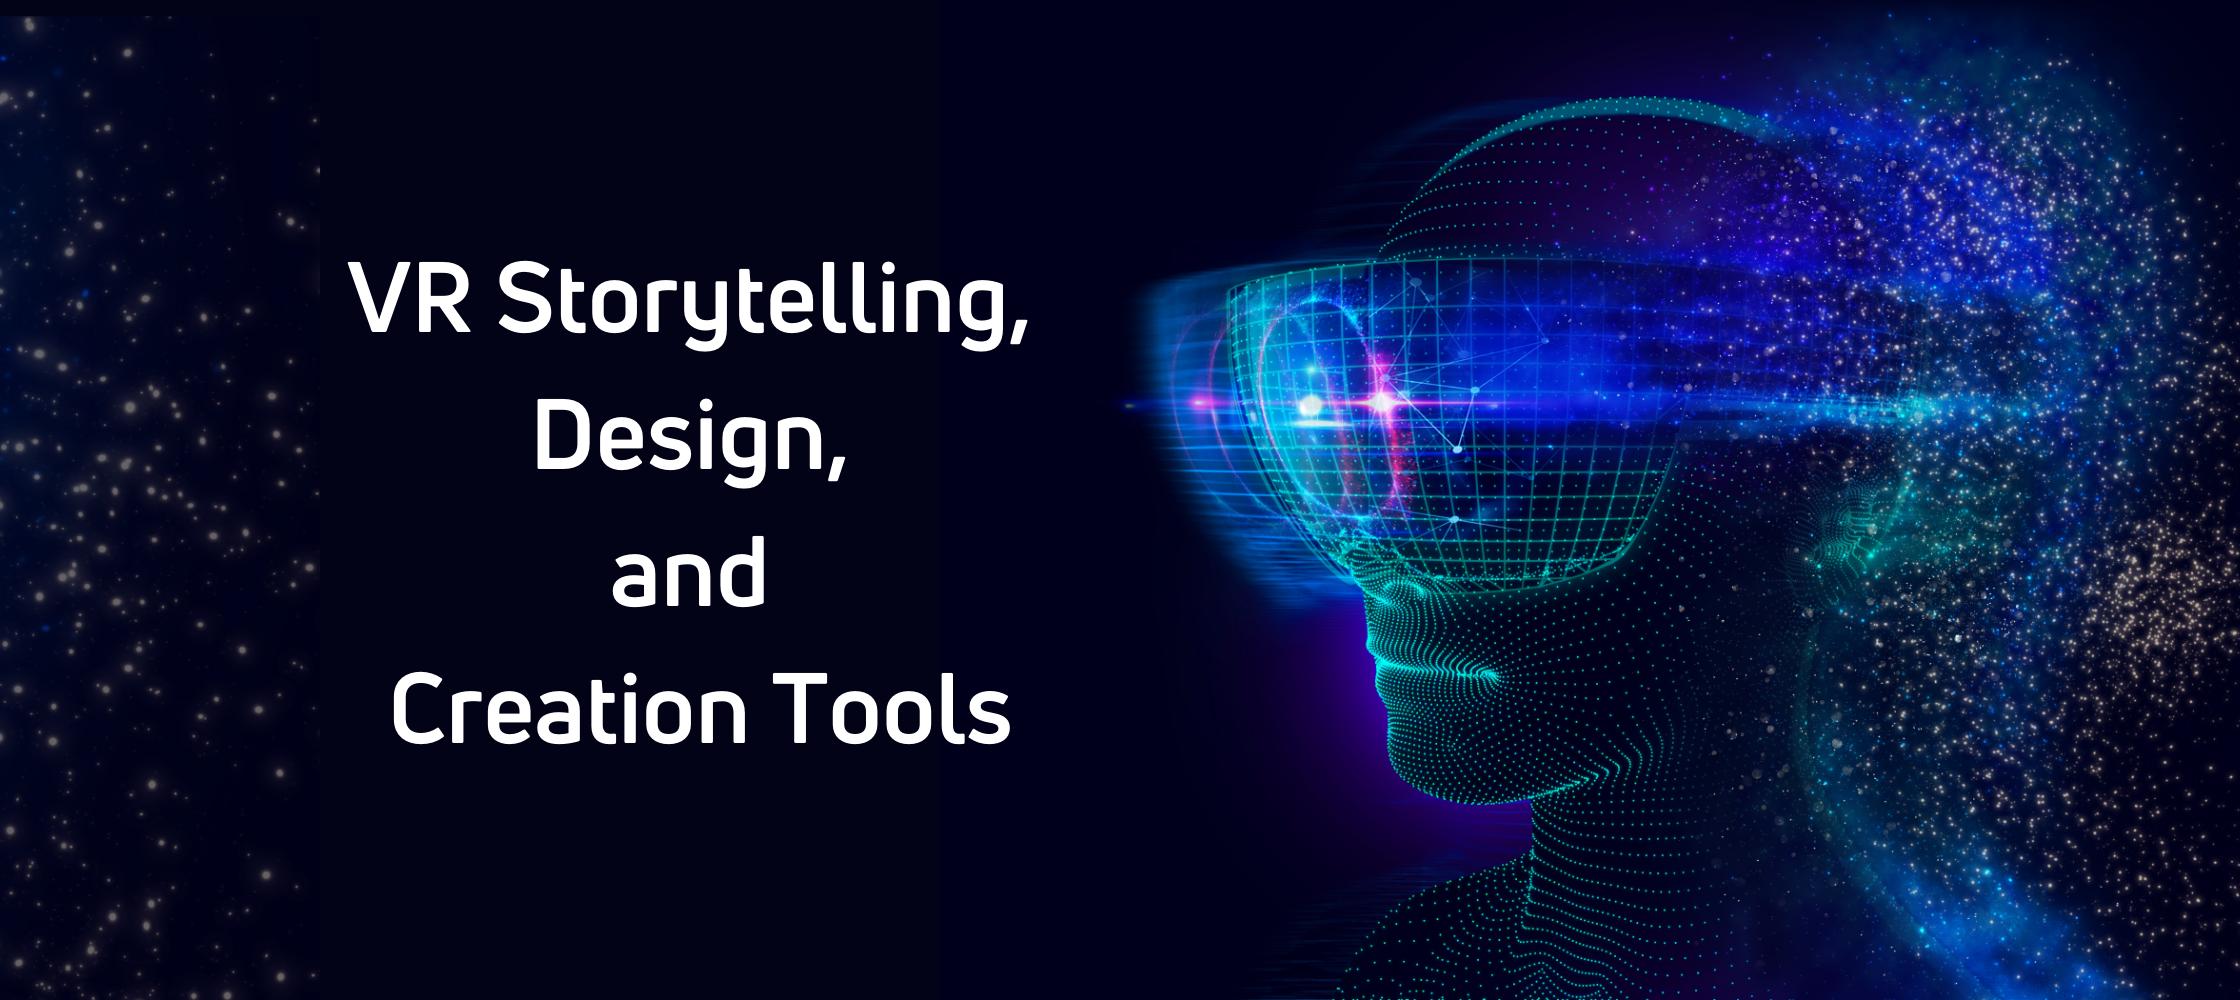 Immersive Technologies Skillnet Hologram wearing Virtual Reality Headset